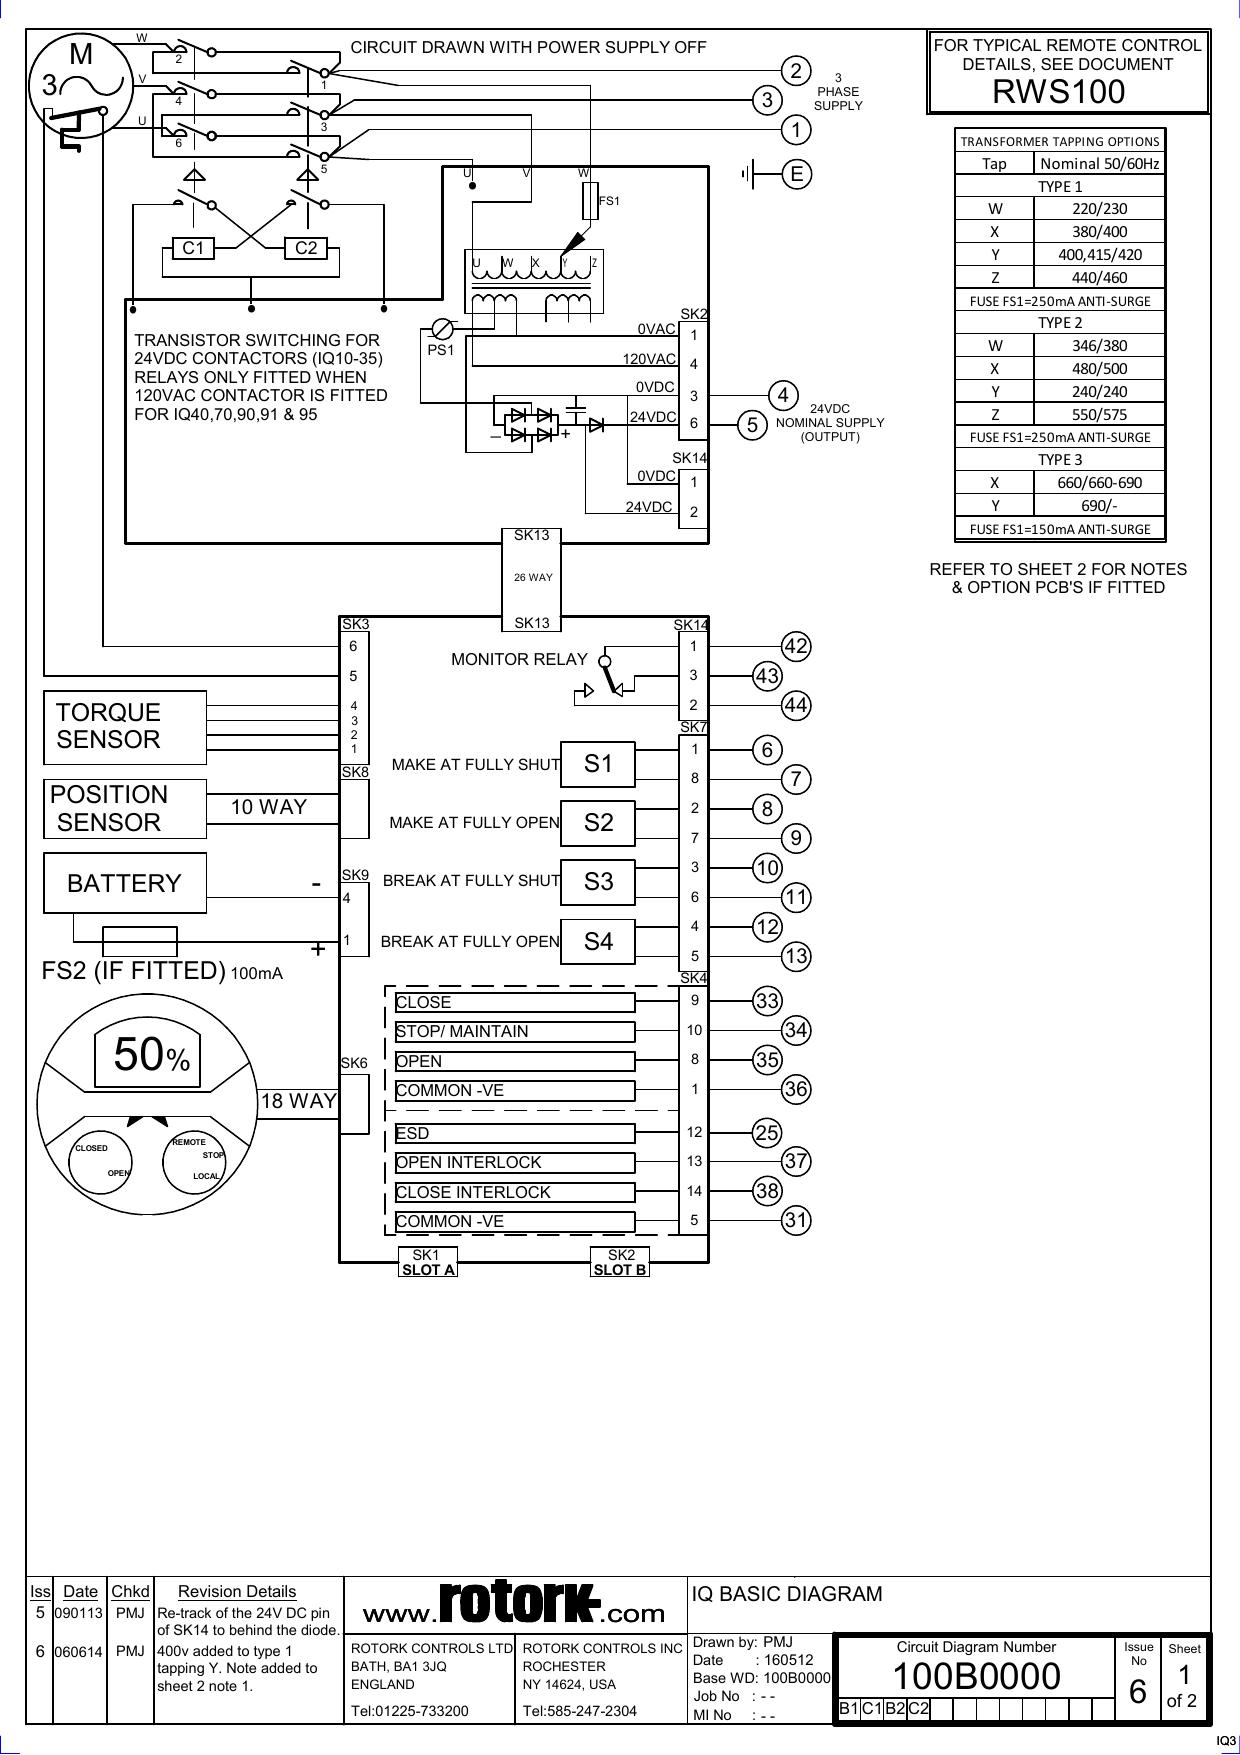 Iq Basic Diagram Manualzz